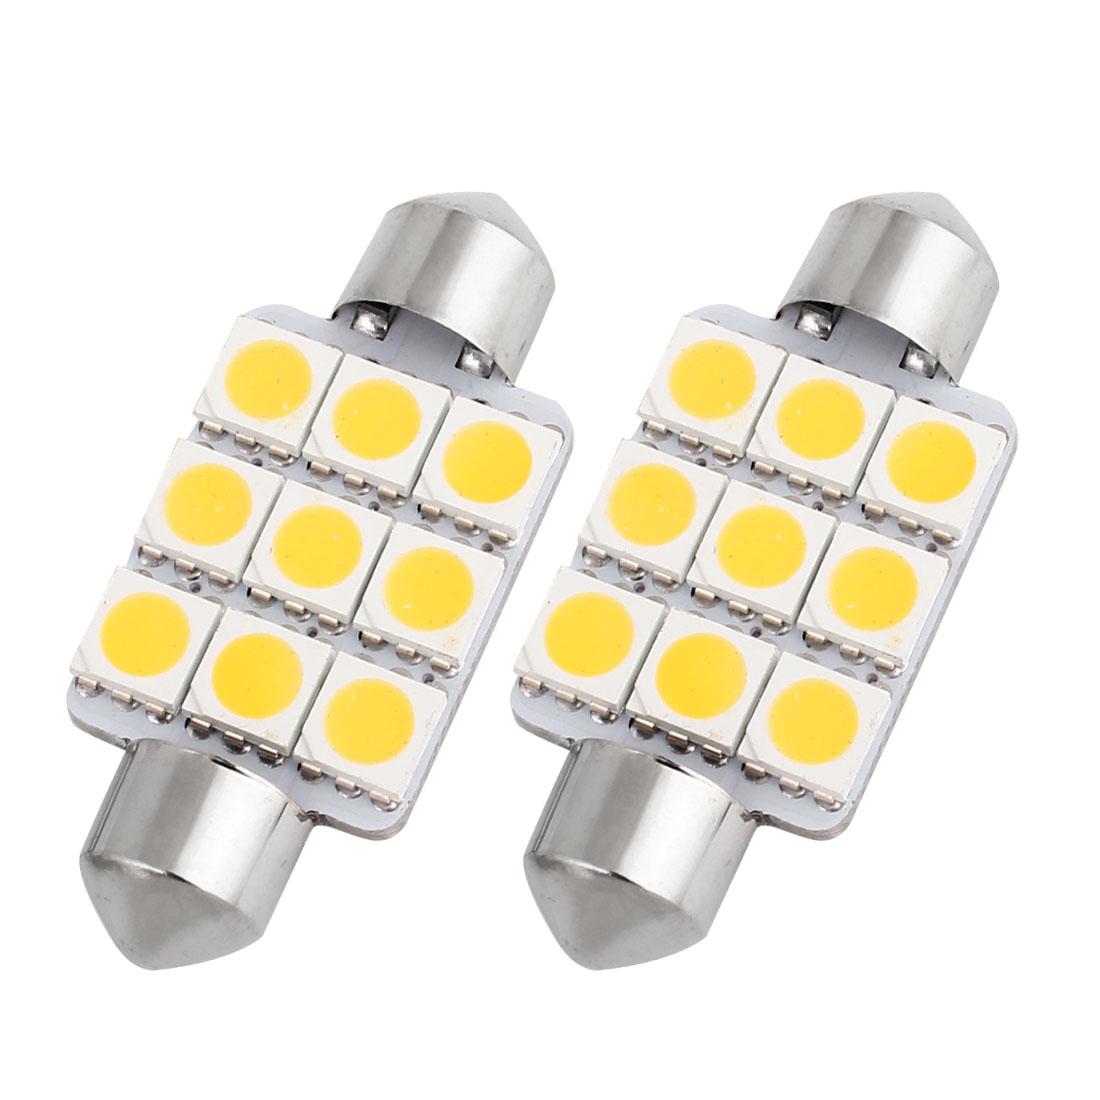 "2 Pcs 39mm 1.54"" 5050 SMD 9-LED Warm White Festoon Dome Light Bulb DE3425 DE3423 Internal"